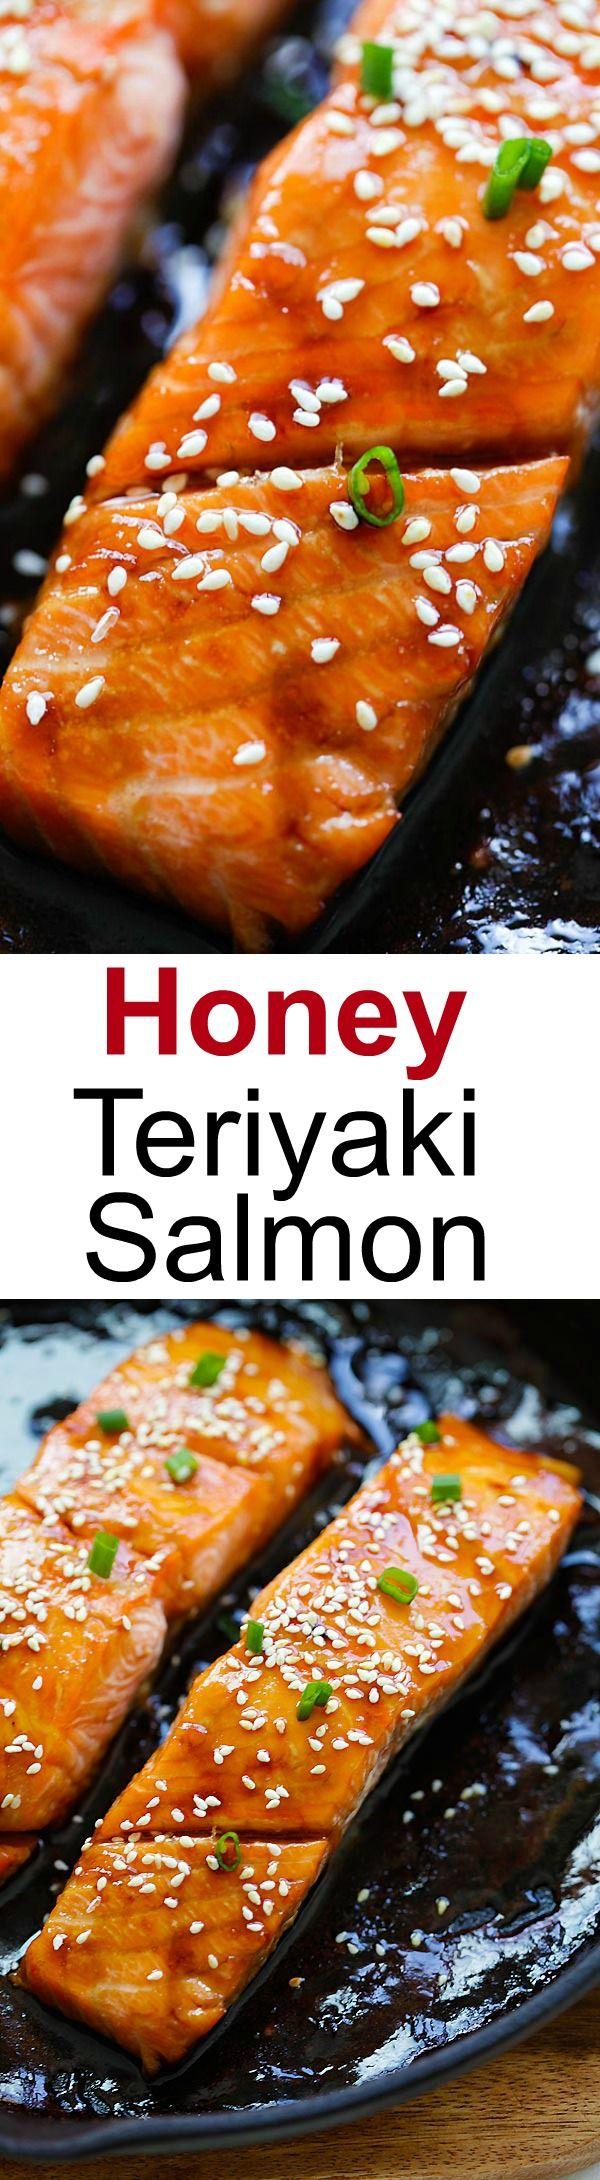 Honey Teriyaki Salmon – sticky sweet, savory salmon with honey teriyaki sauce. Cooks in a skillet or baked in oven. Dinner takes 10 mins | rasamalaysia.com